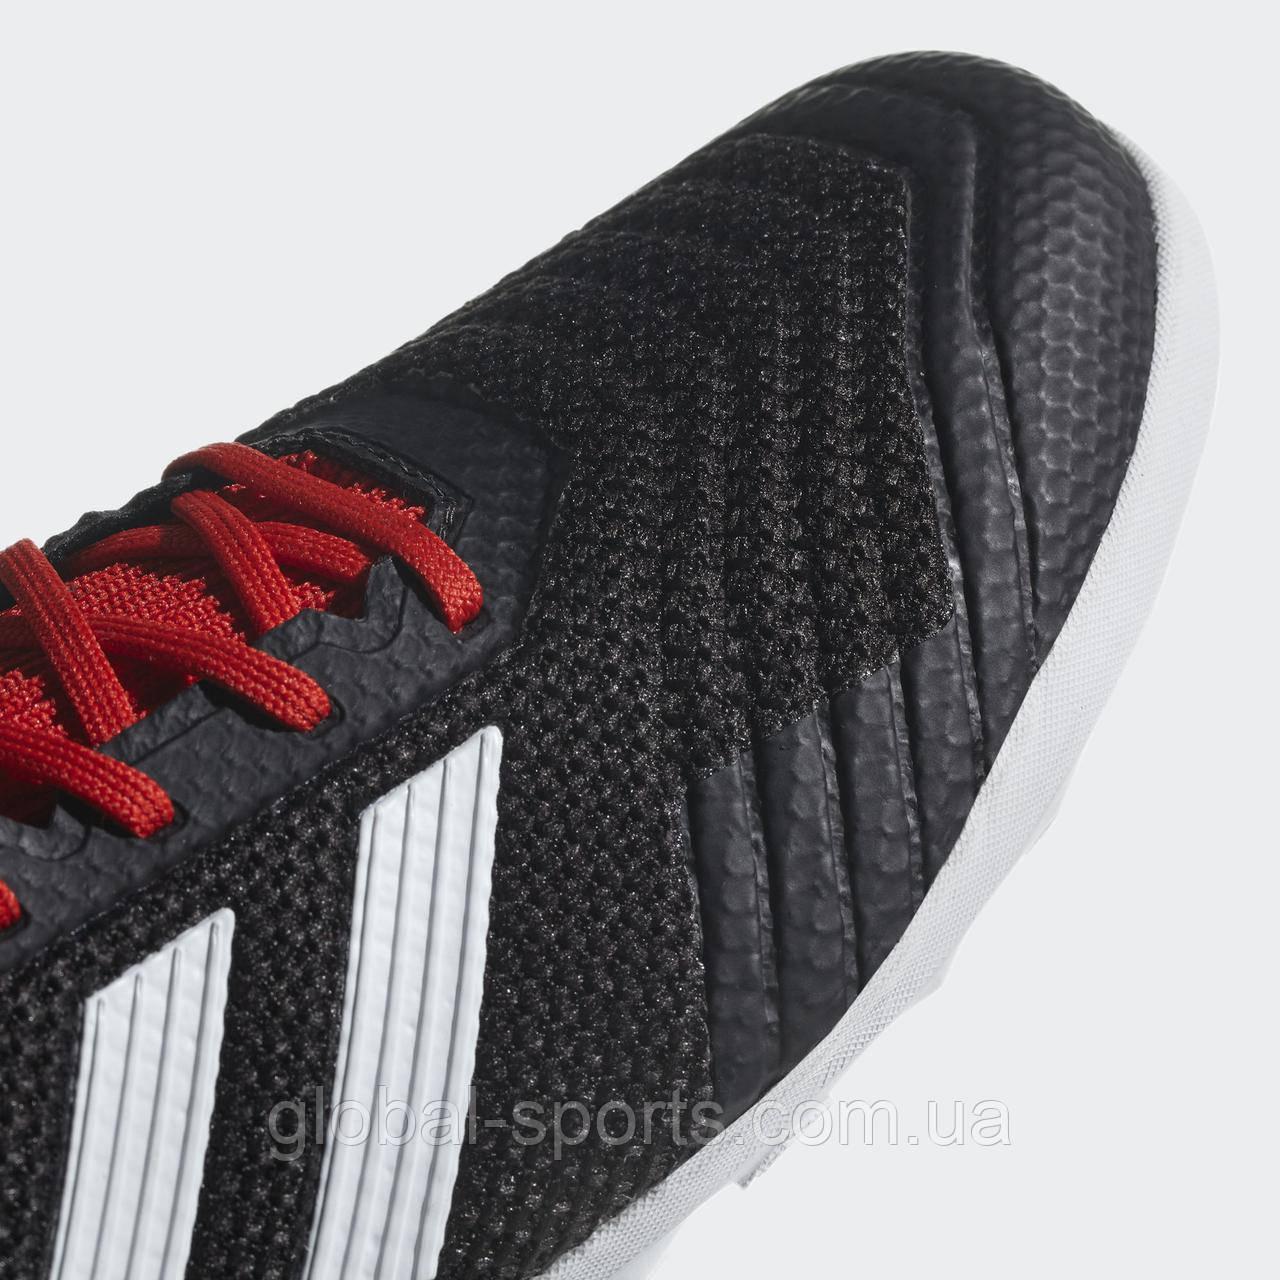 be34f381 Футбольные бутсы (футзалки) Adidas Predator Tango 18.3 IN(Артикул:DB2128),  цена 1 490 грн., купить в Харькове — Prom.ua (ID#771562979)